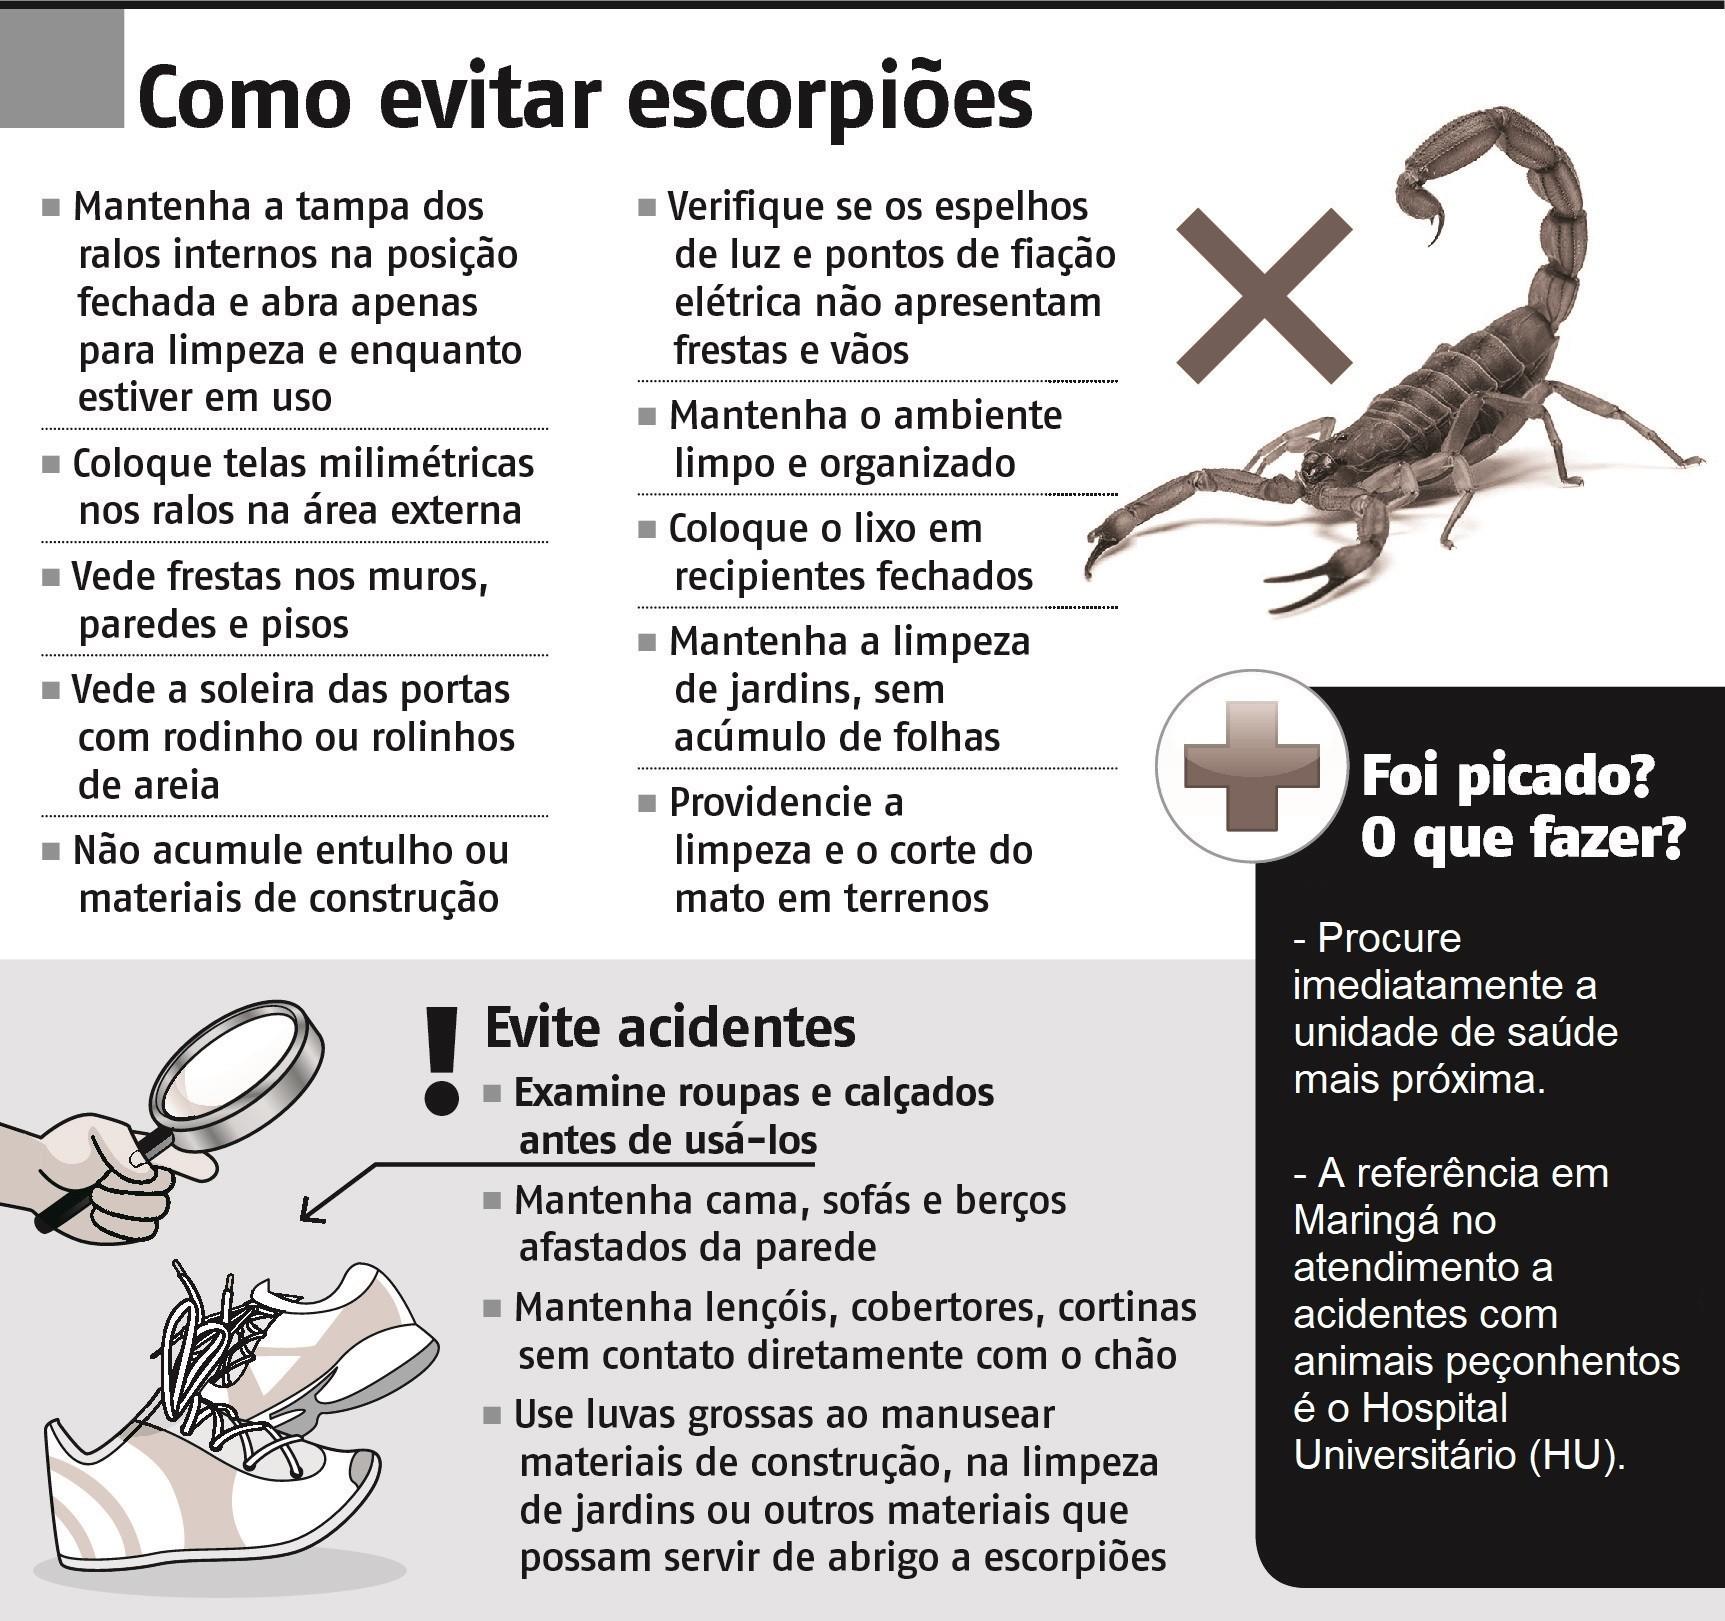 Infográfico/Folhapress